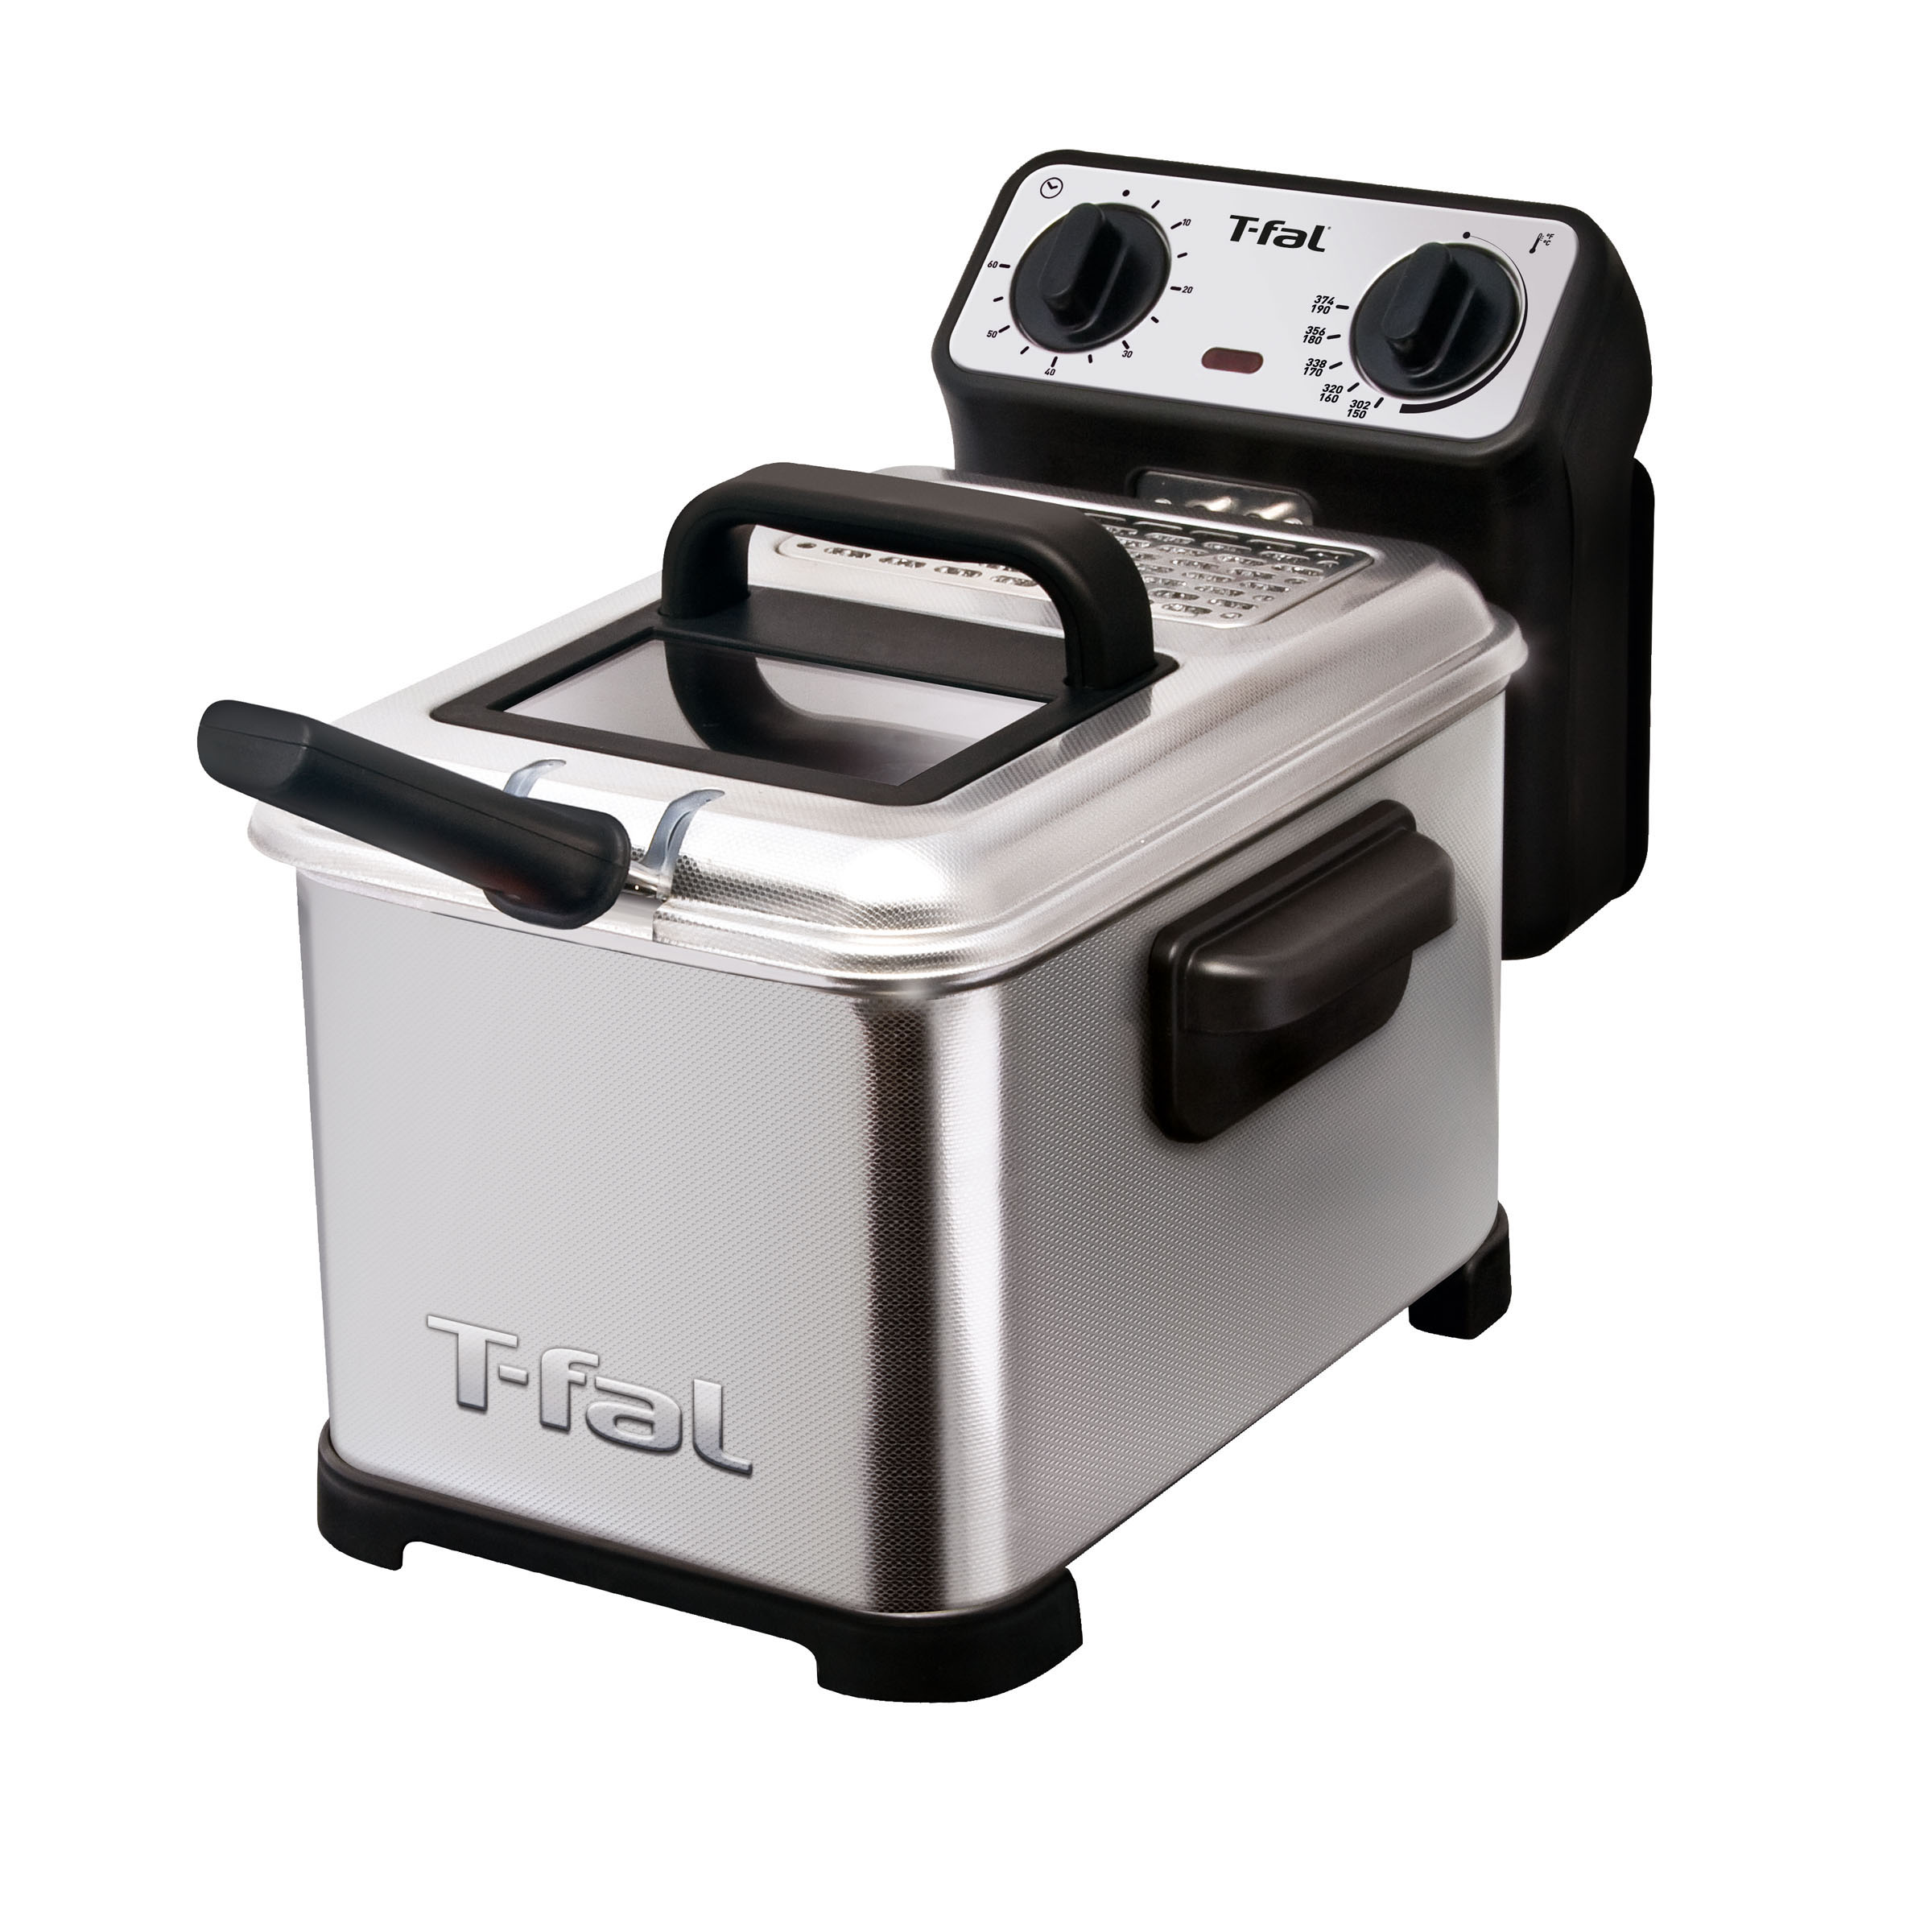 T-fal 3.17-Quart Deep Fryer | FR4049001